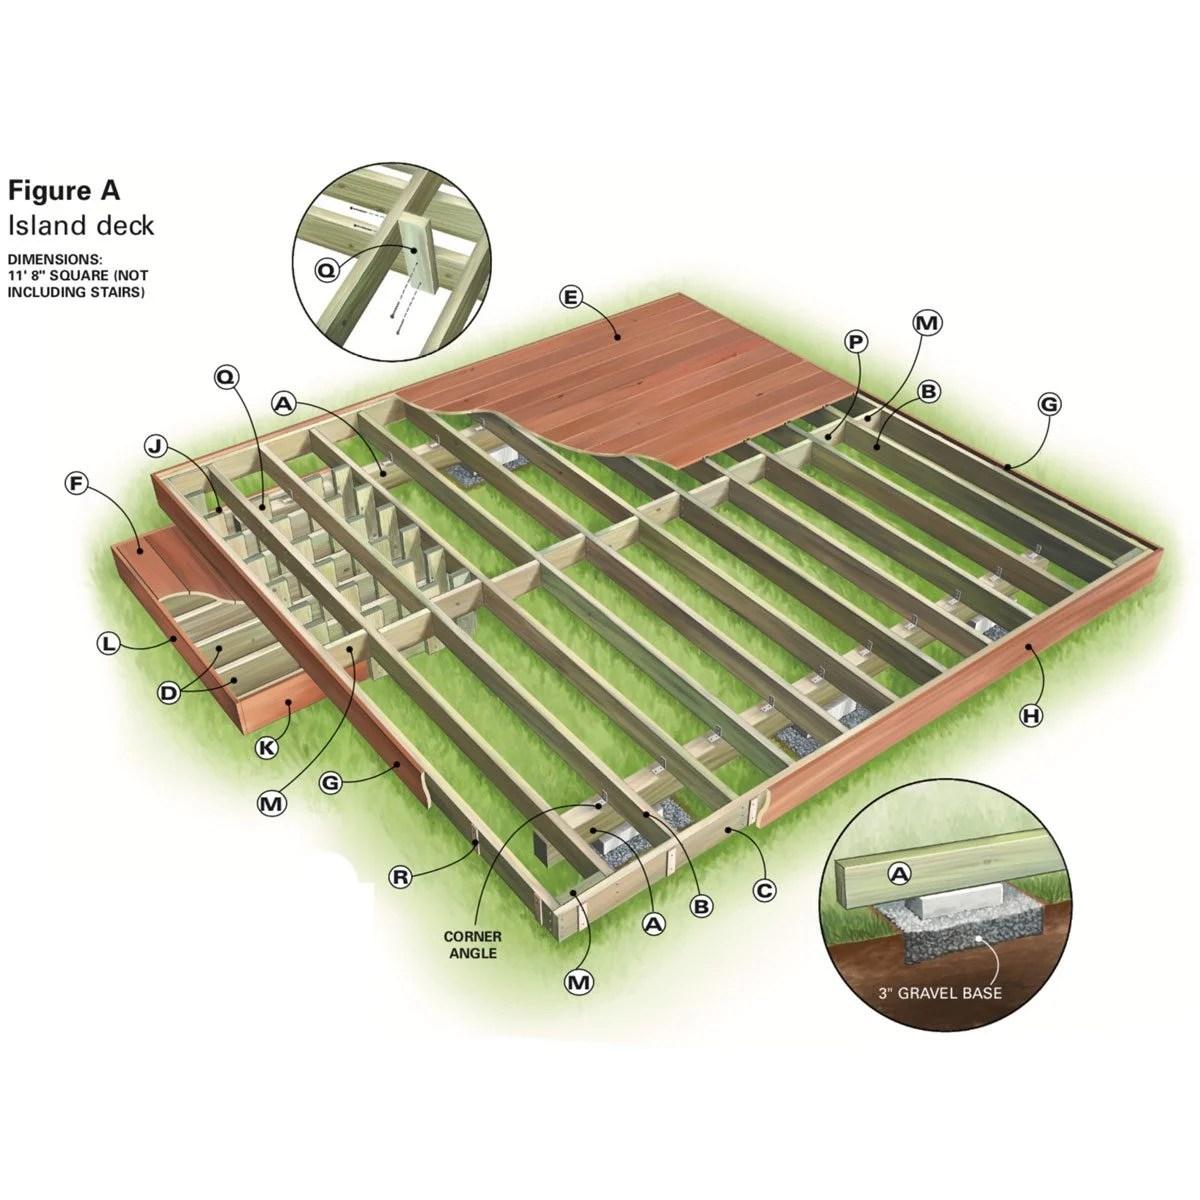 hight resolution of figure a island deck